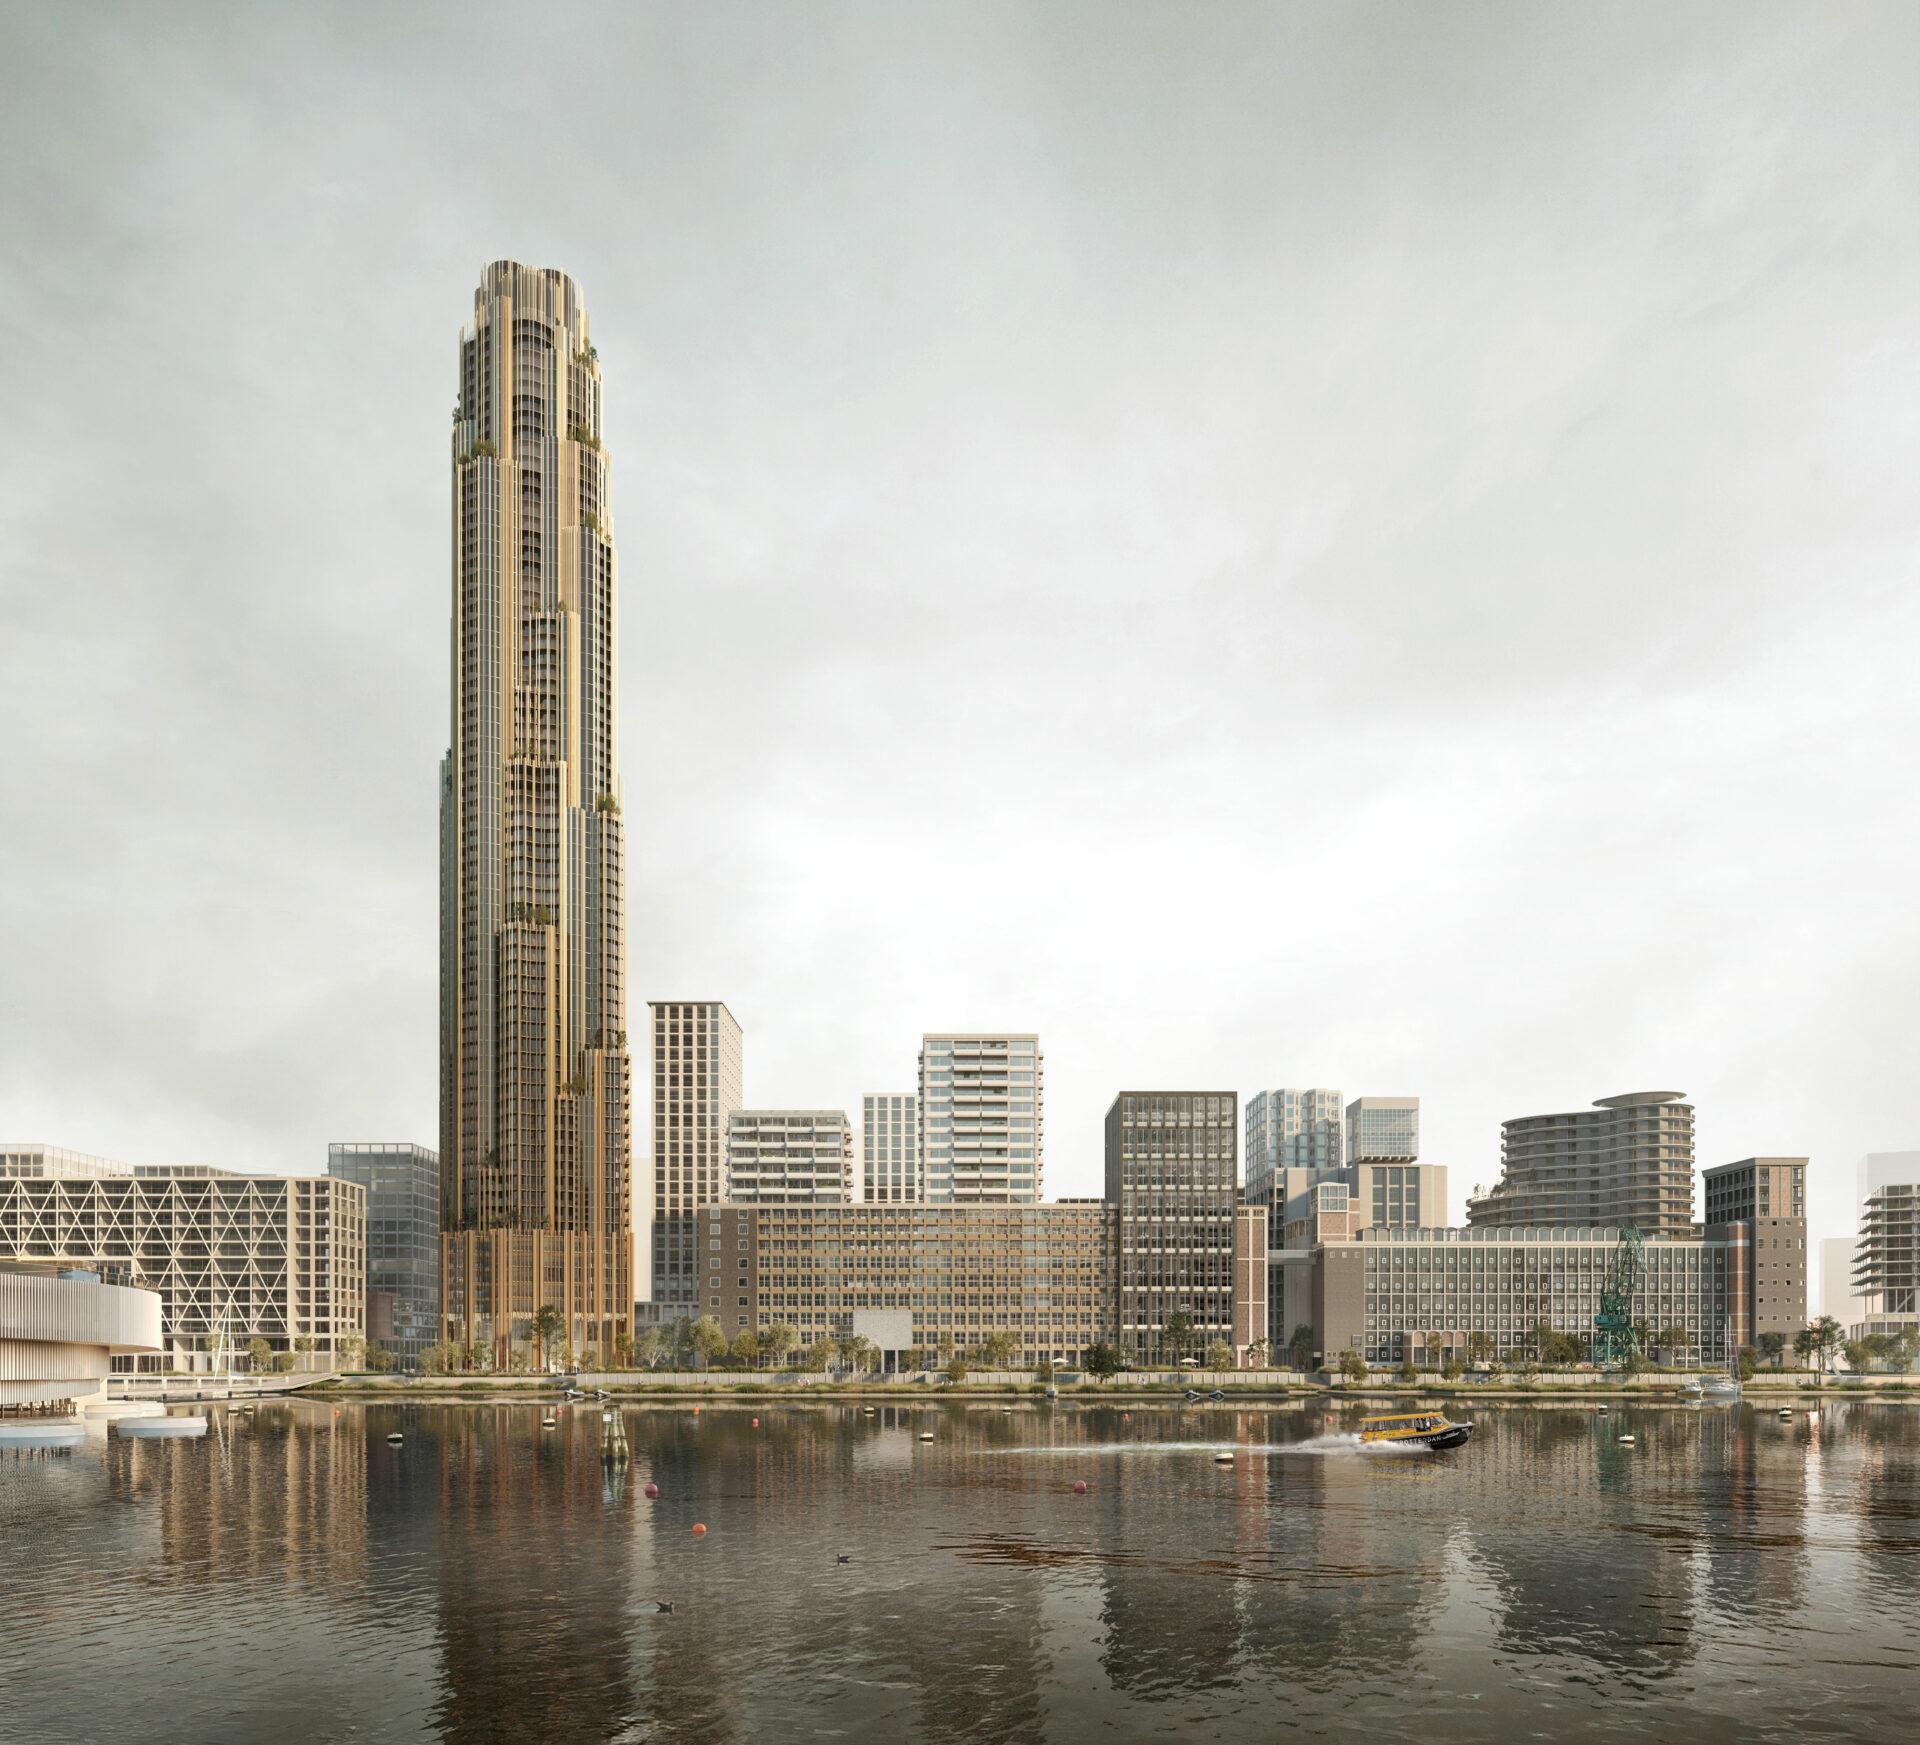 https://static.red-company.nl/wp-content/uploads/2020/11/27124920/725_V1_waterfront_WINHOV-web-1920x1745.jpg